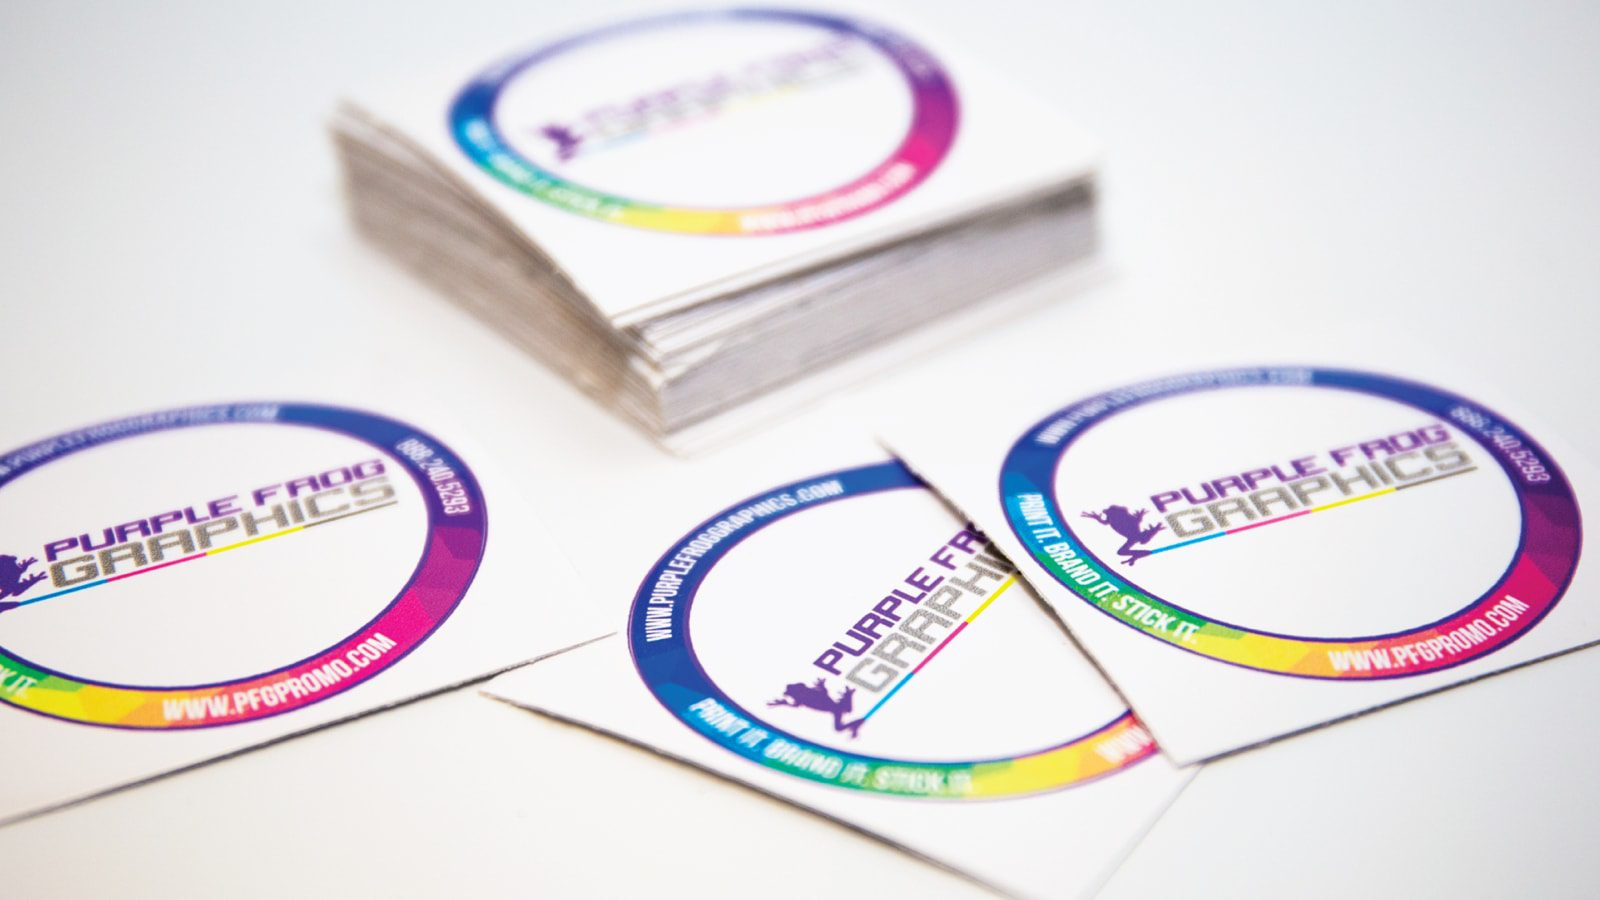 custom die cut stickers by Purple Frog Graphics